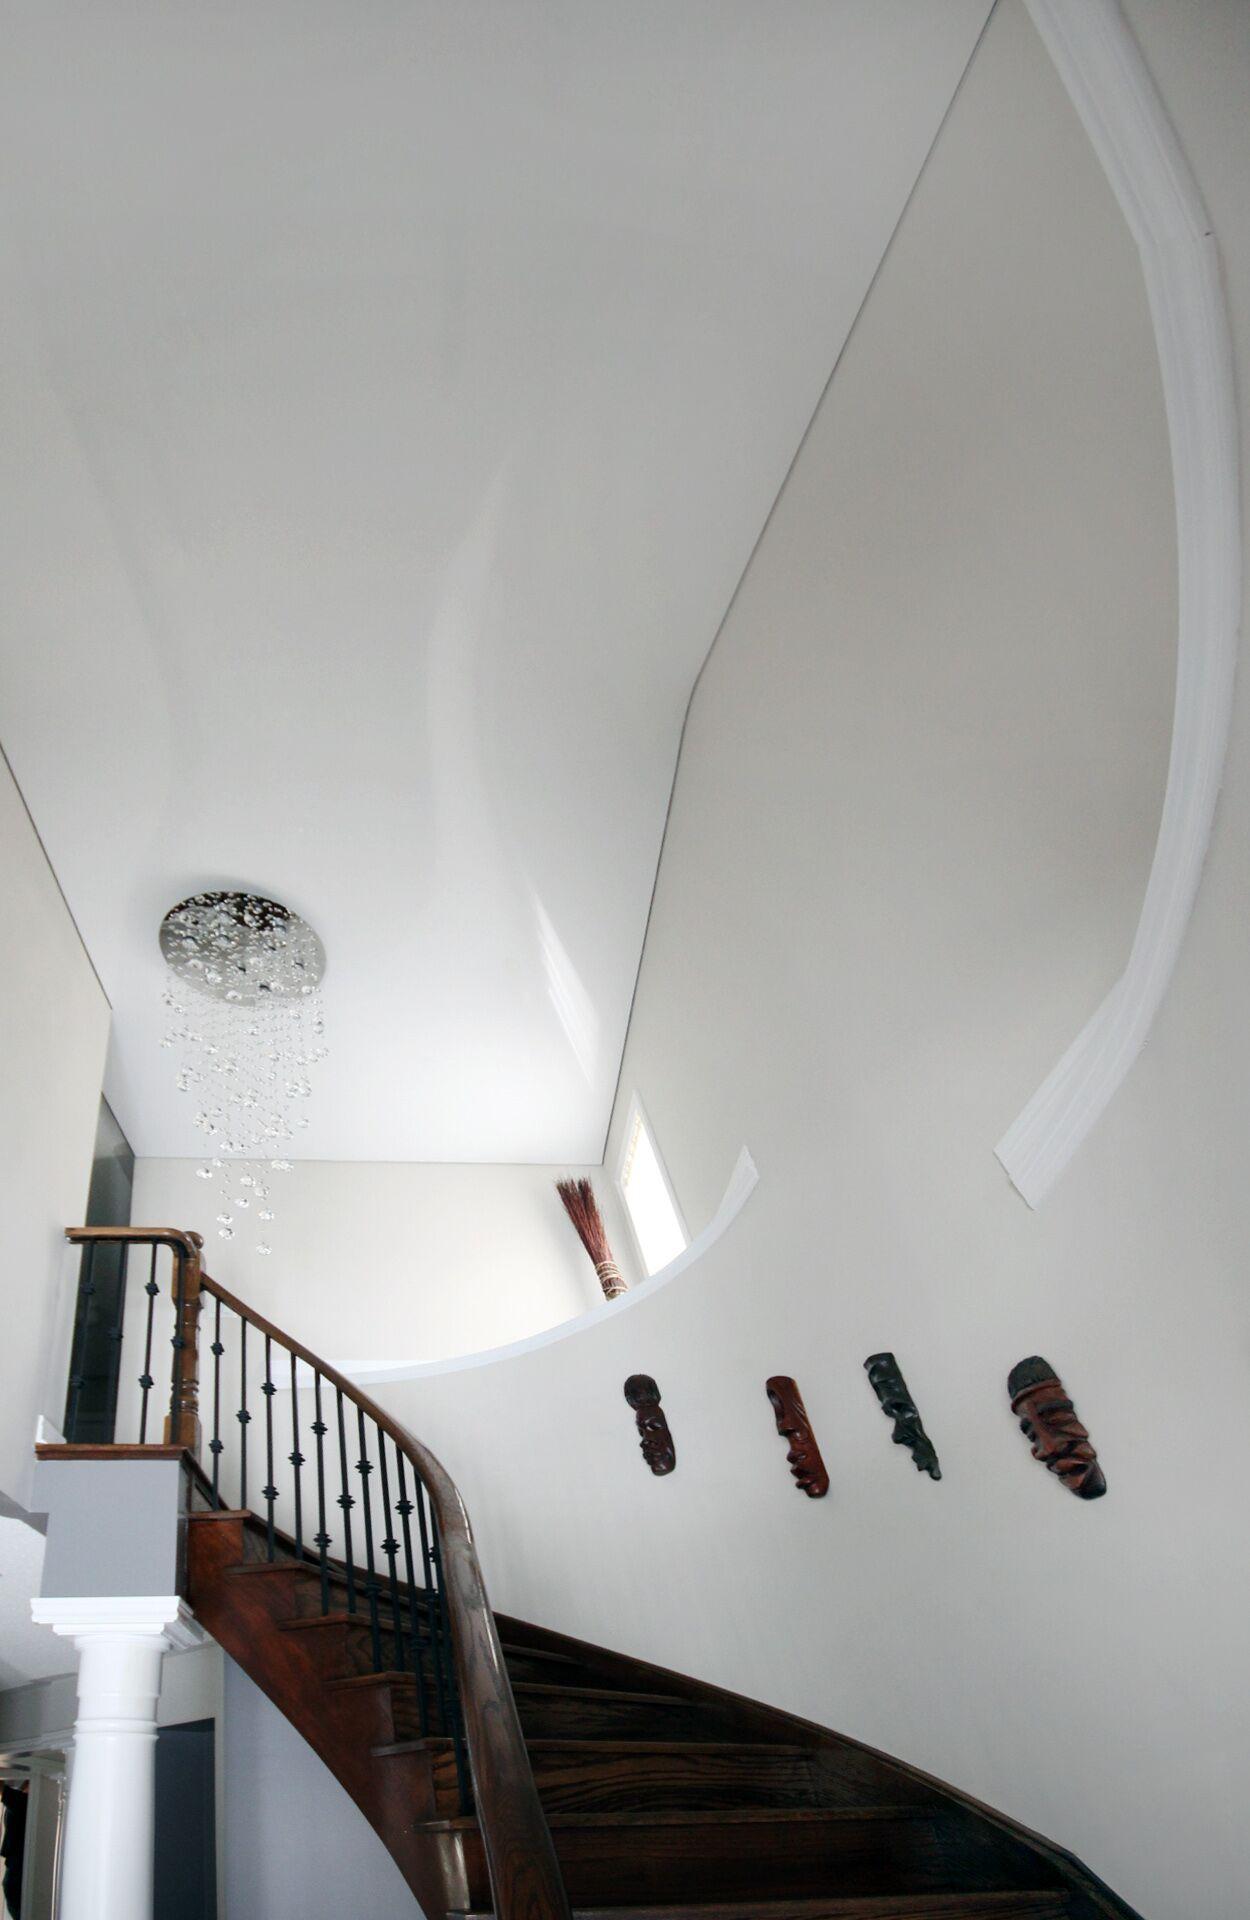 How to make a stretch ceiling